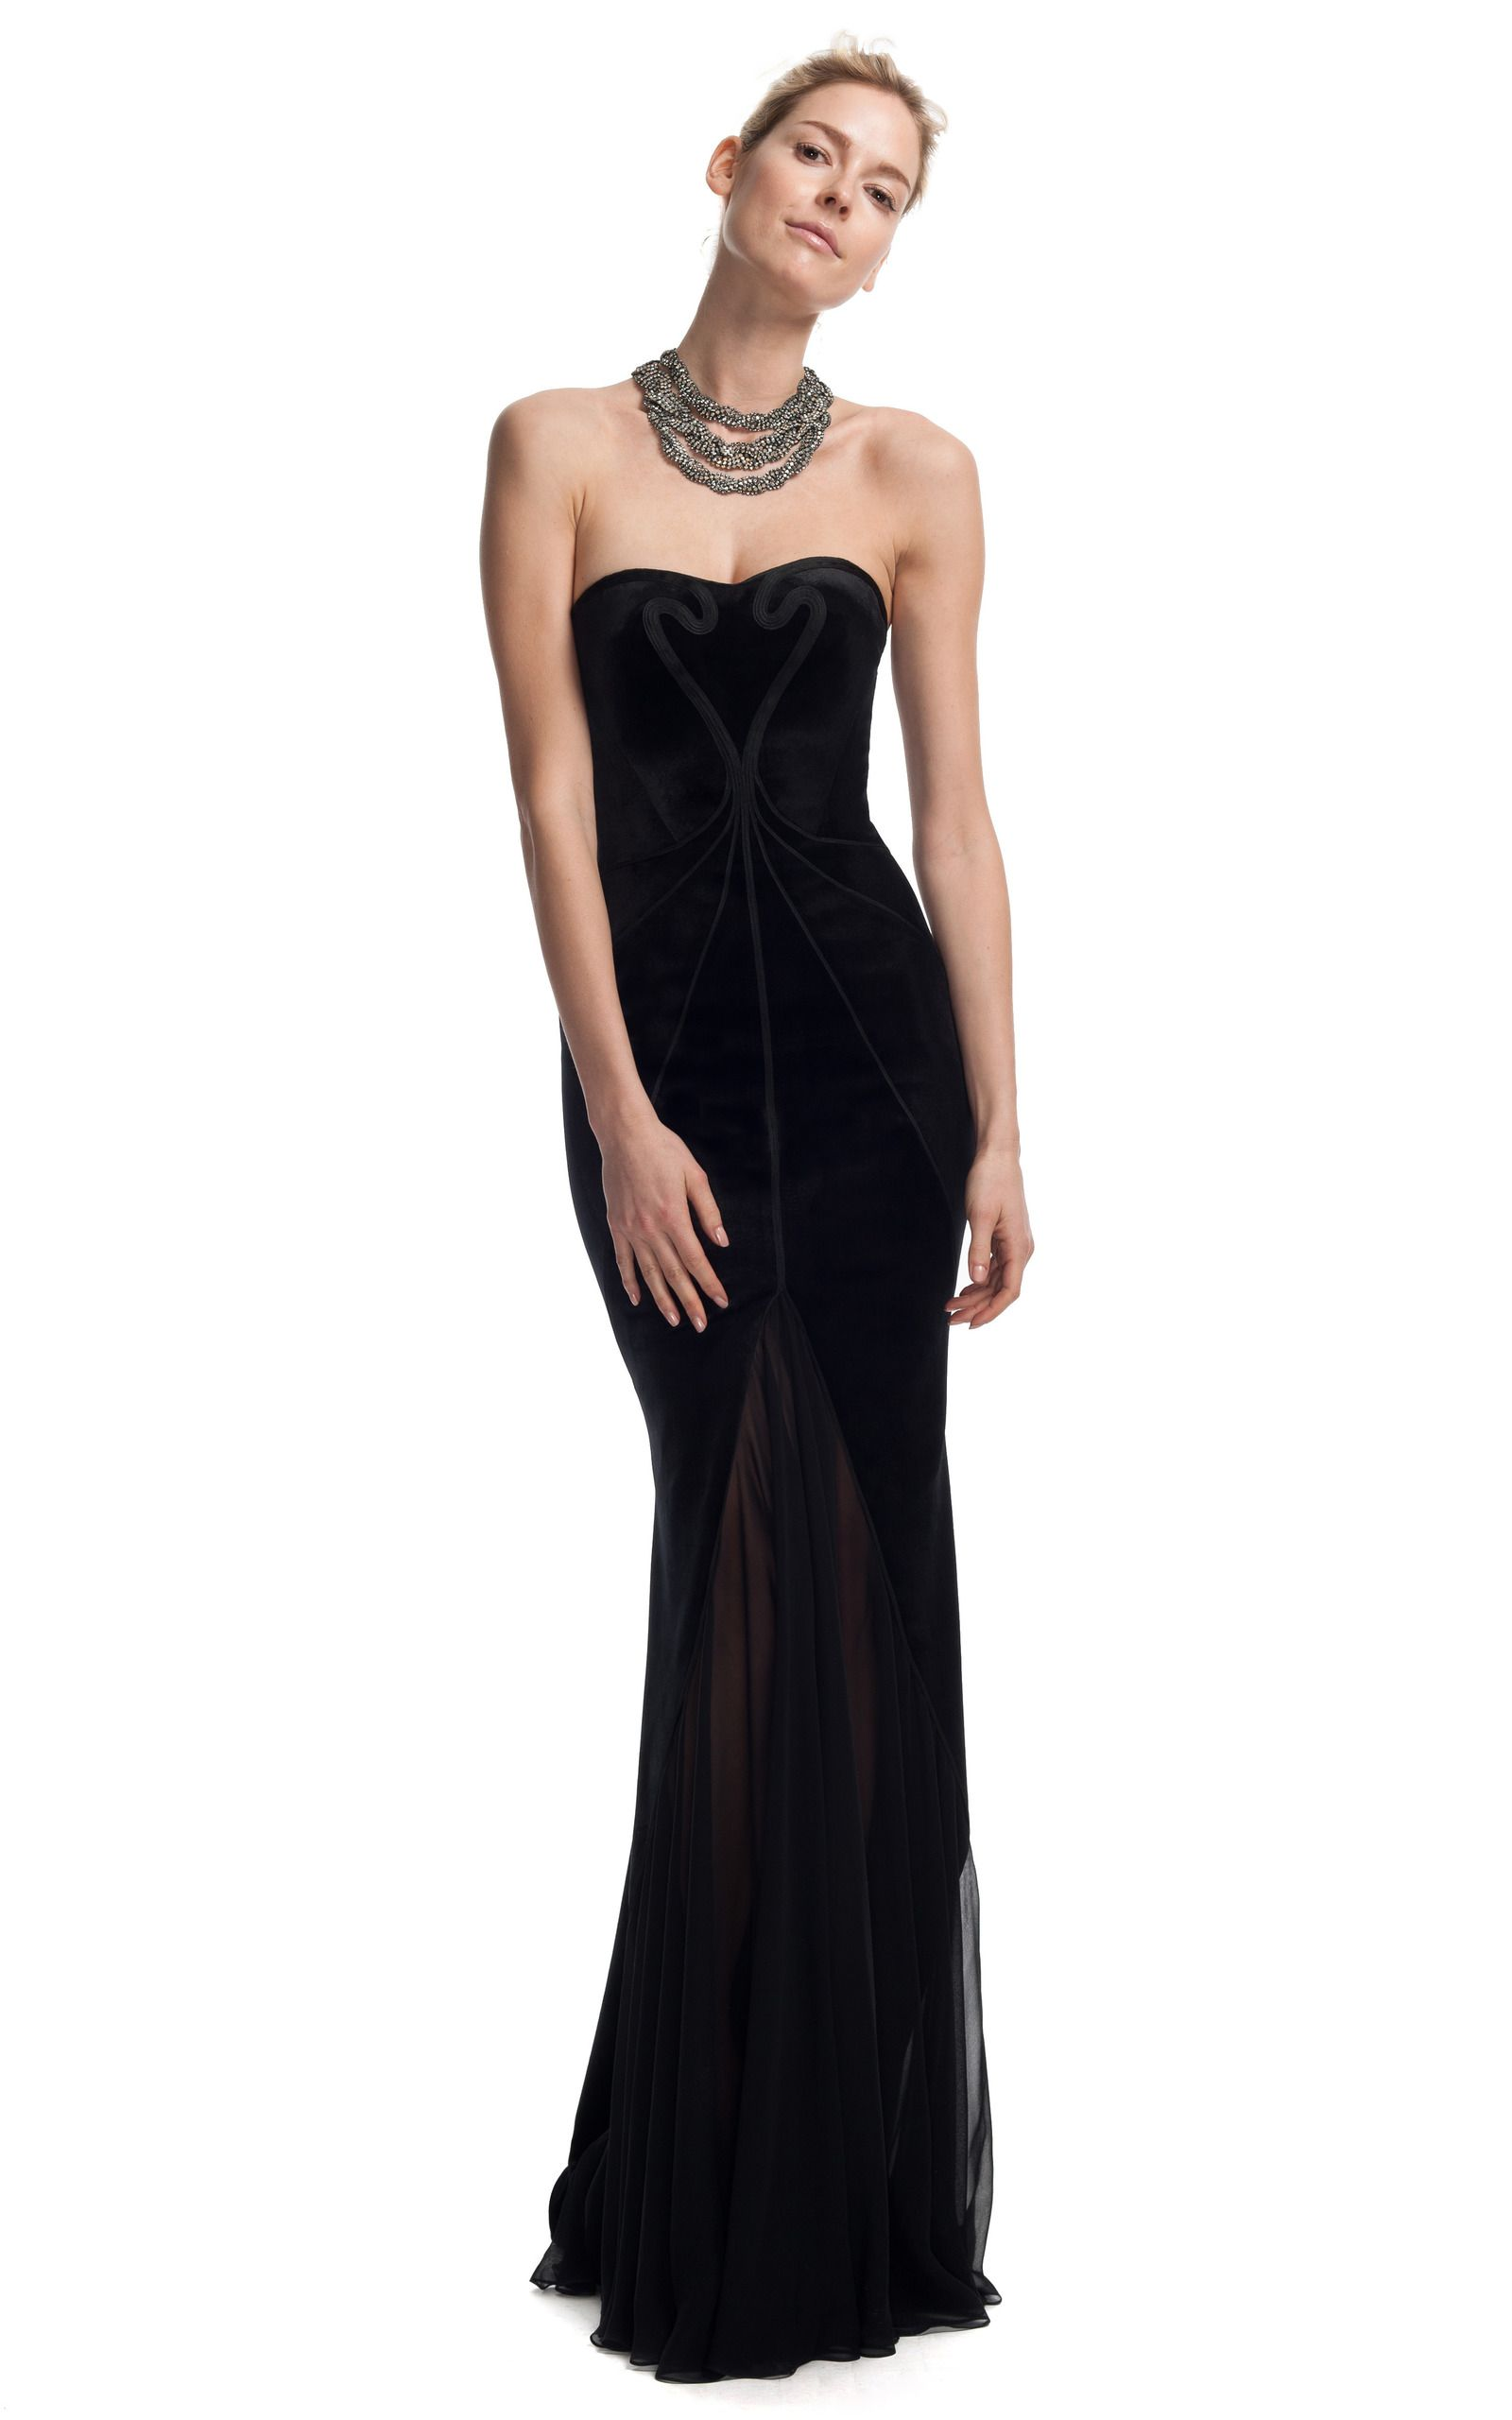 Jet Evening Gown by Zac Posen for Preorder on Moda Operandi   Moda ...